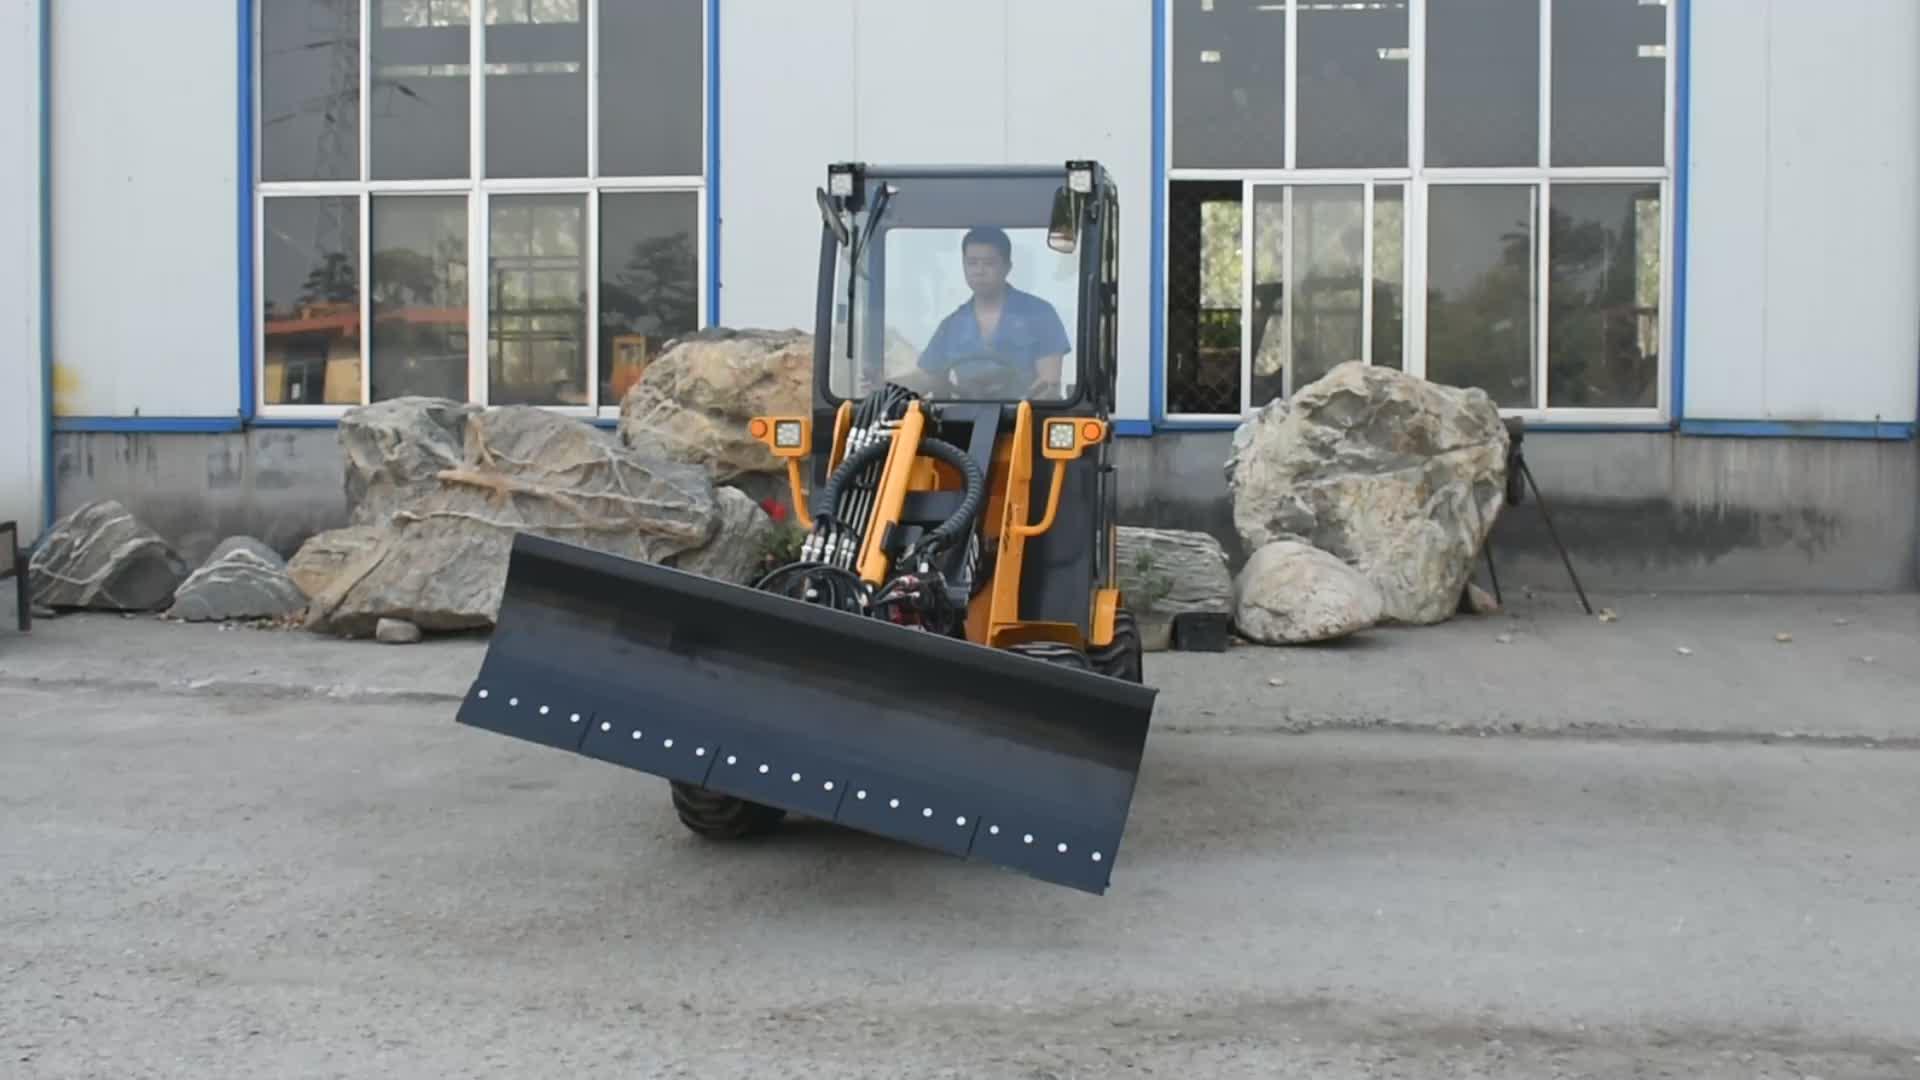 Bobcat sobre orugas skid steer mini excavadora dumper dozer blade pista cargadora de ruedas